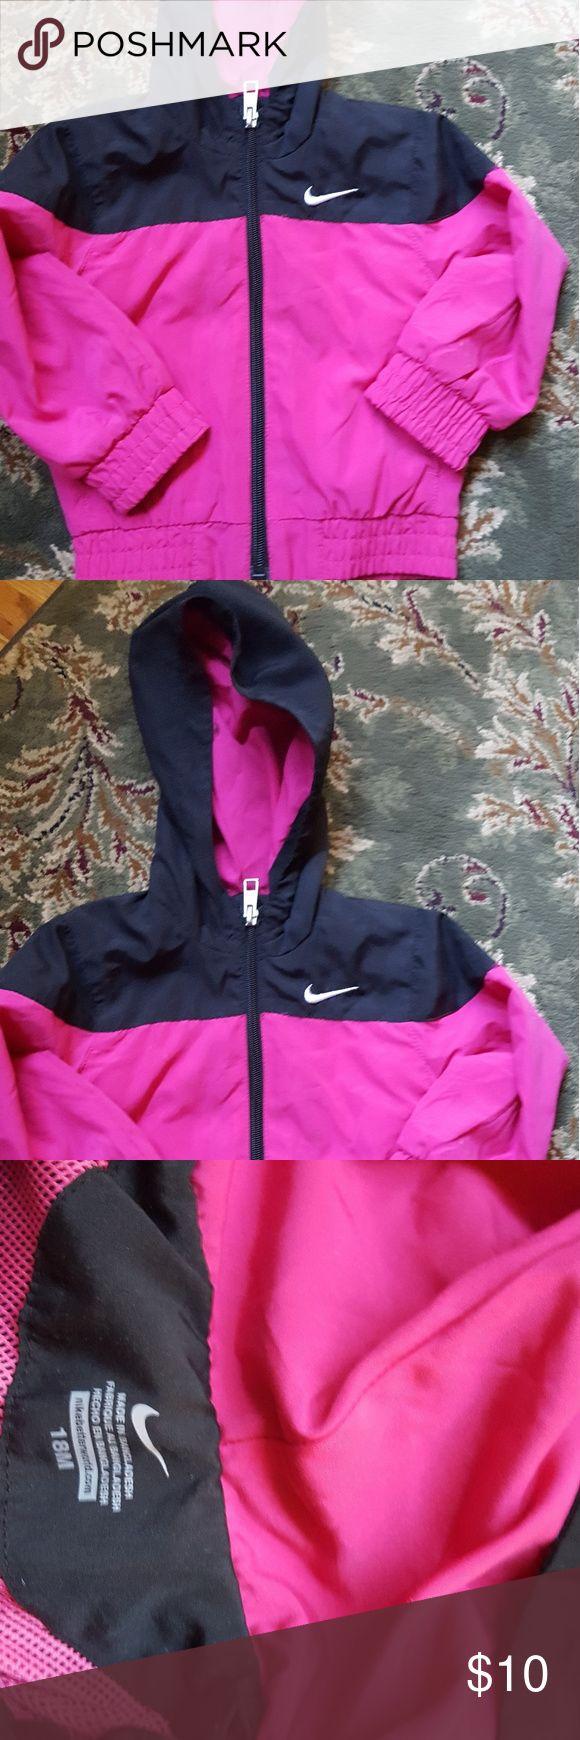 Nike windbreaker Pink and black hooded jacket Nike Jackets & Coats Raincoats